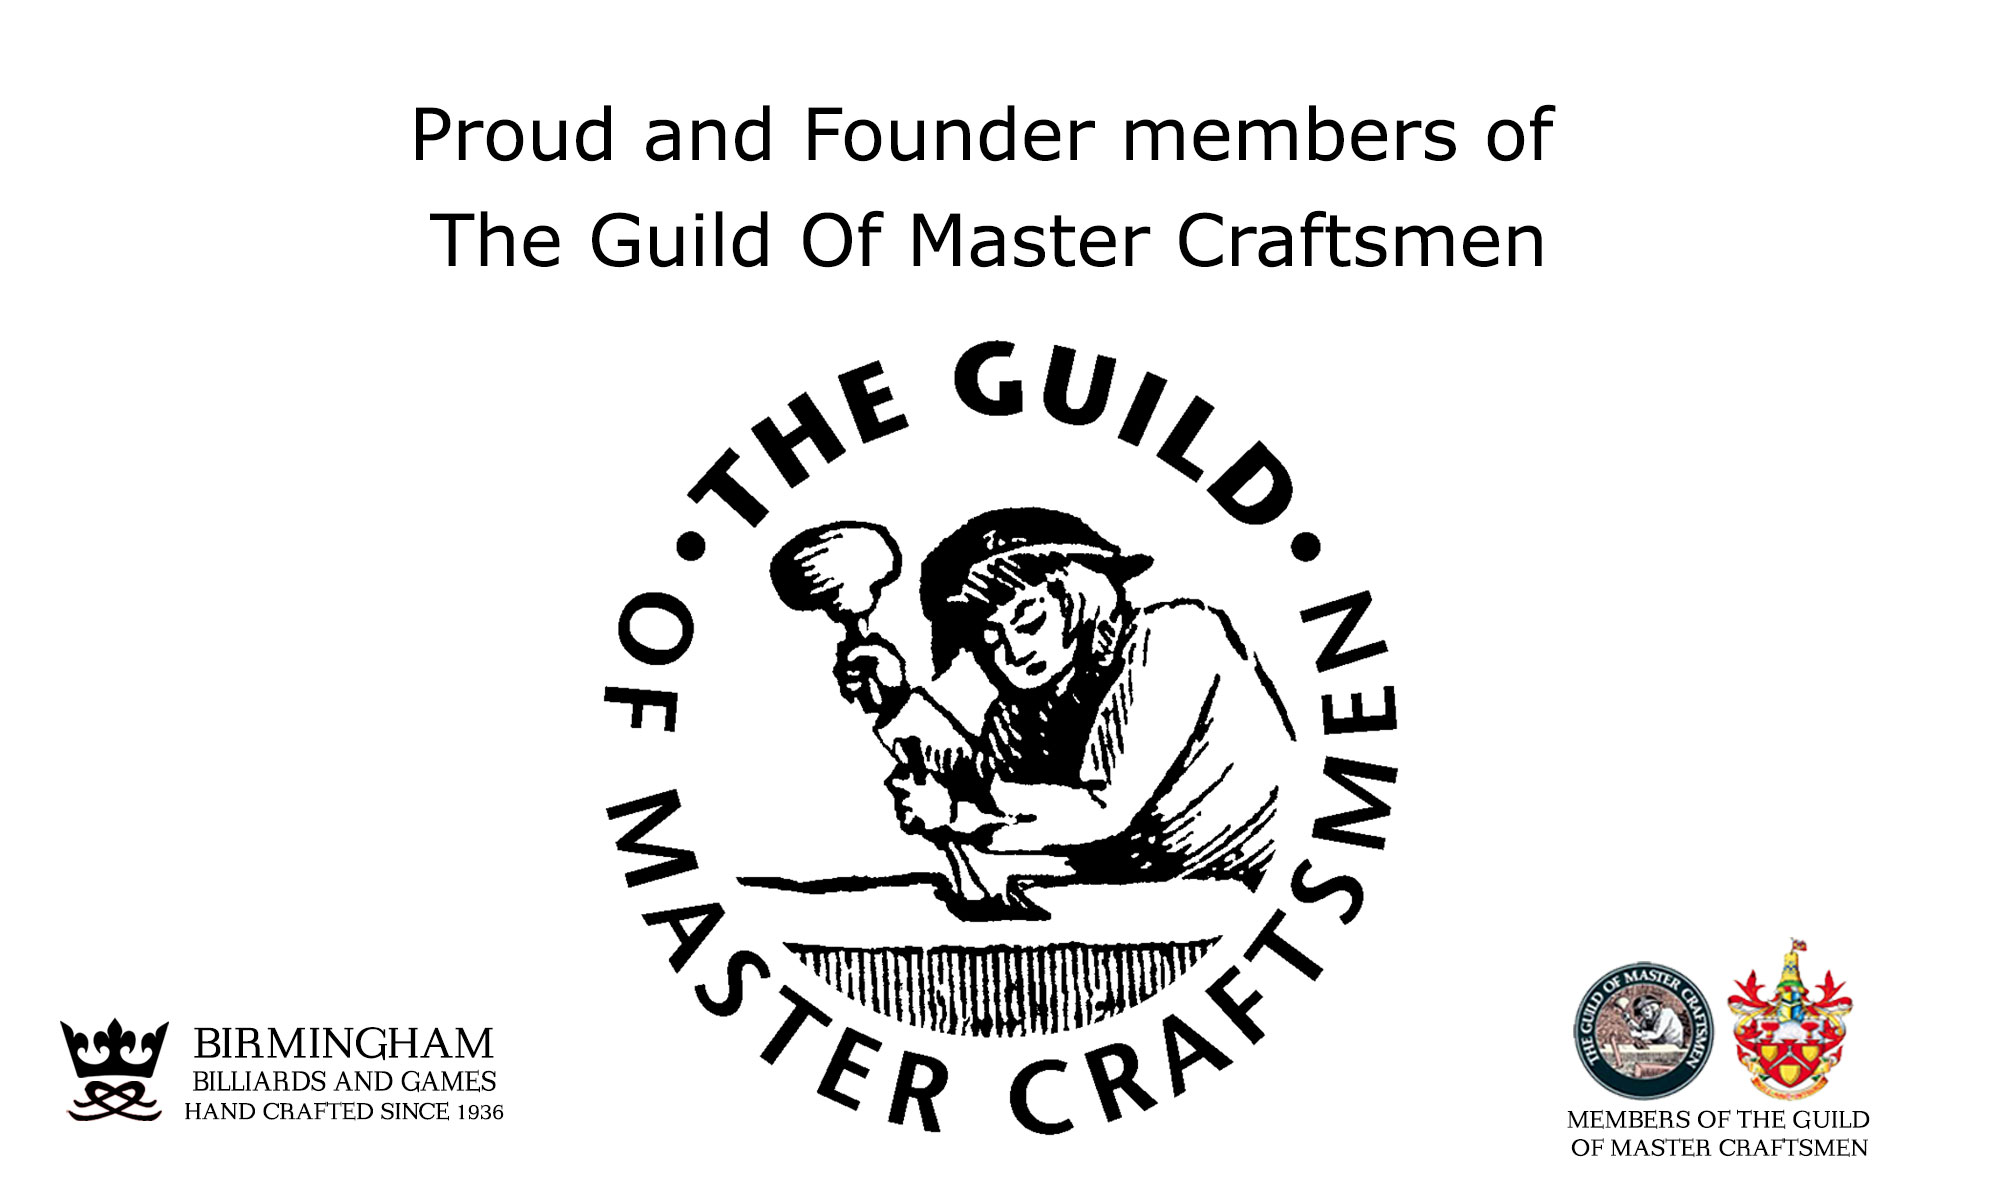 Birmingham Billiards are members of The guild of master craftsmen